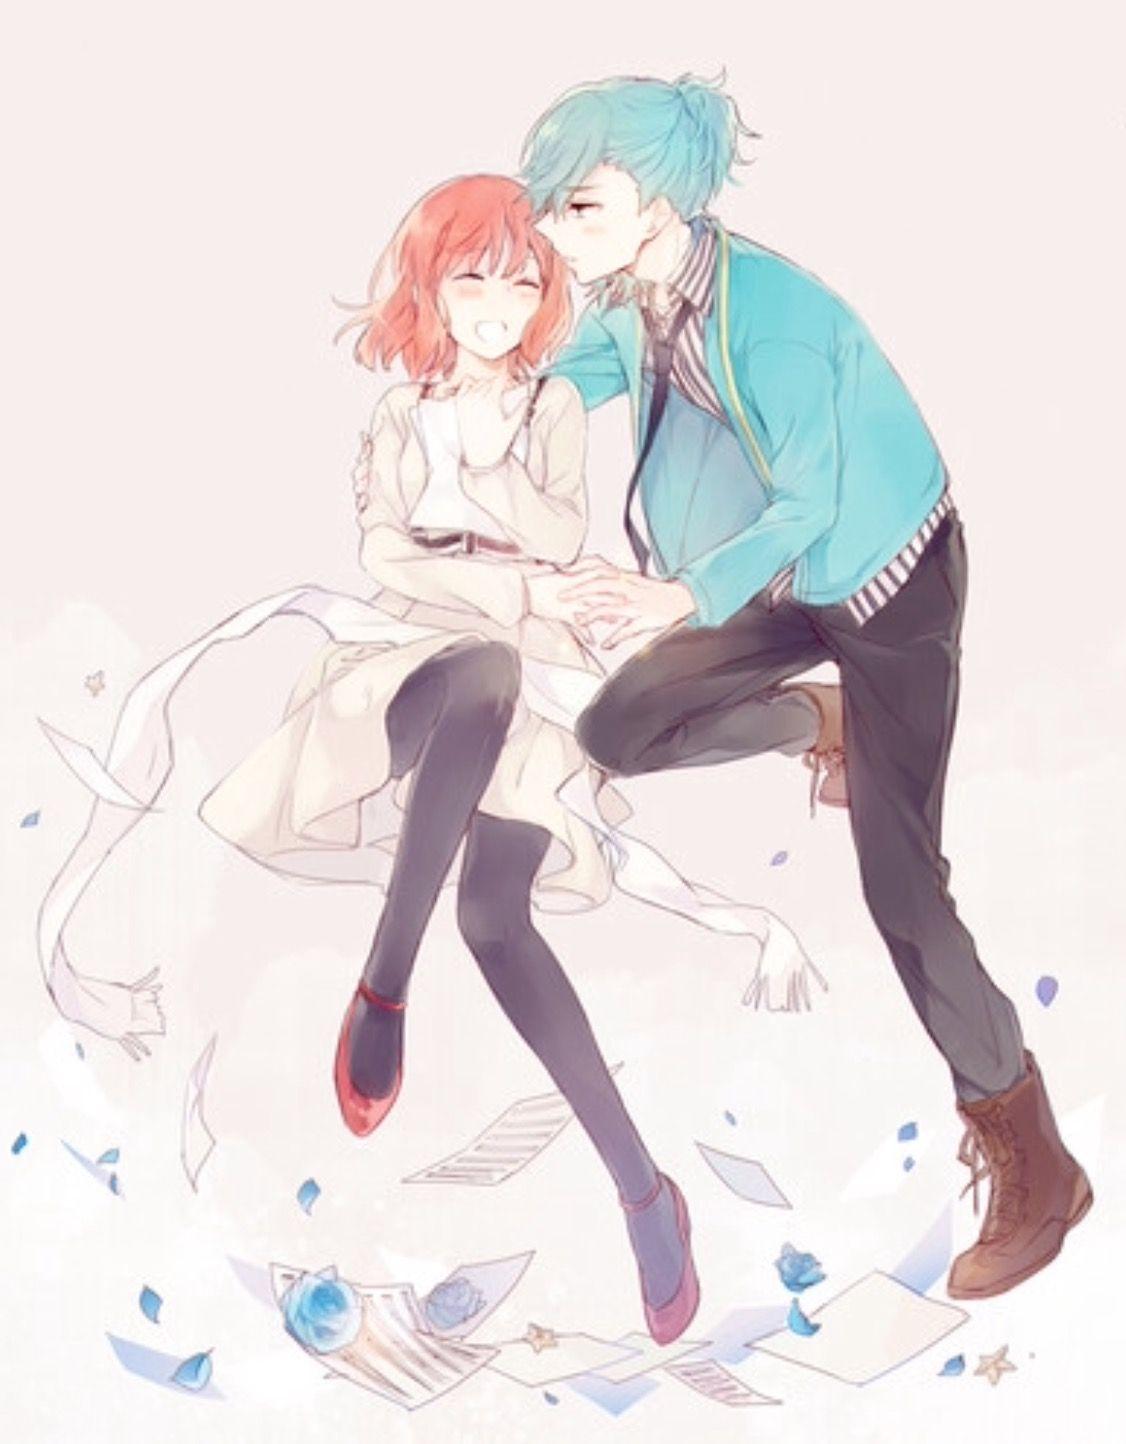 Pin by kittysc28 on uta no prince sama cute couple uta